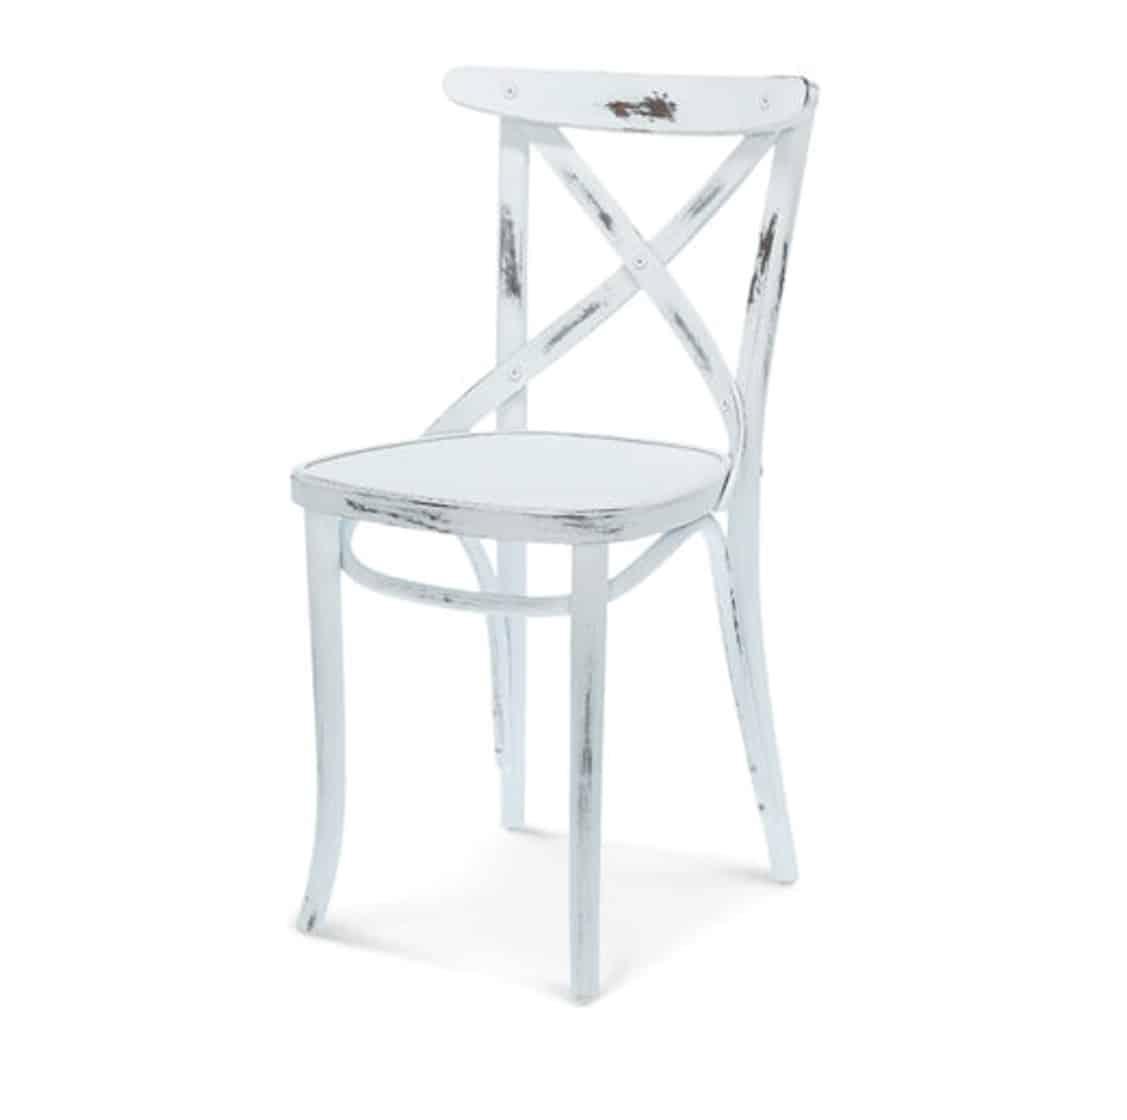 Cruz cross back bentwood side chair 8810 DeFrae Contract Furniture